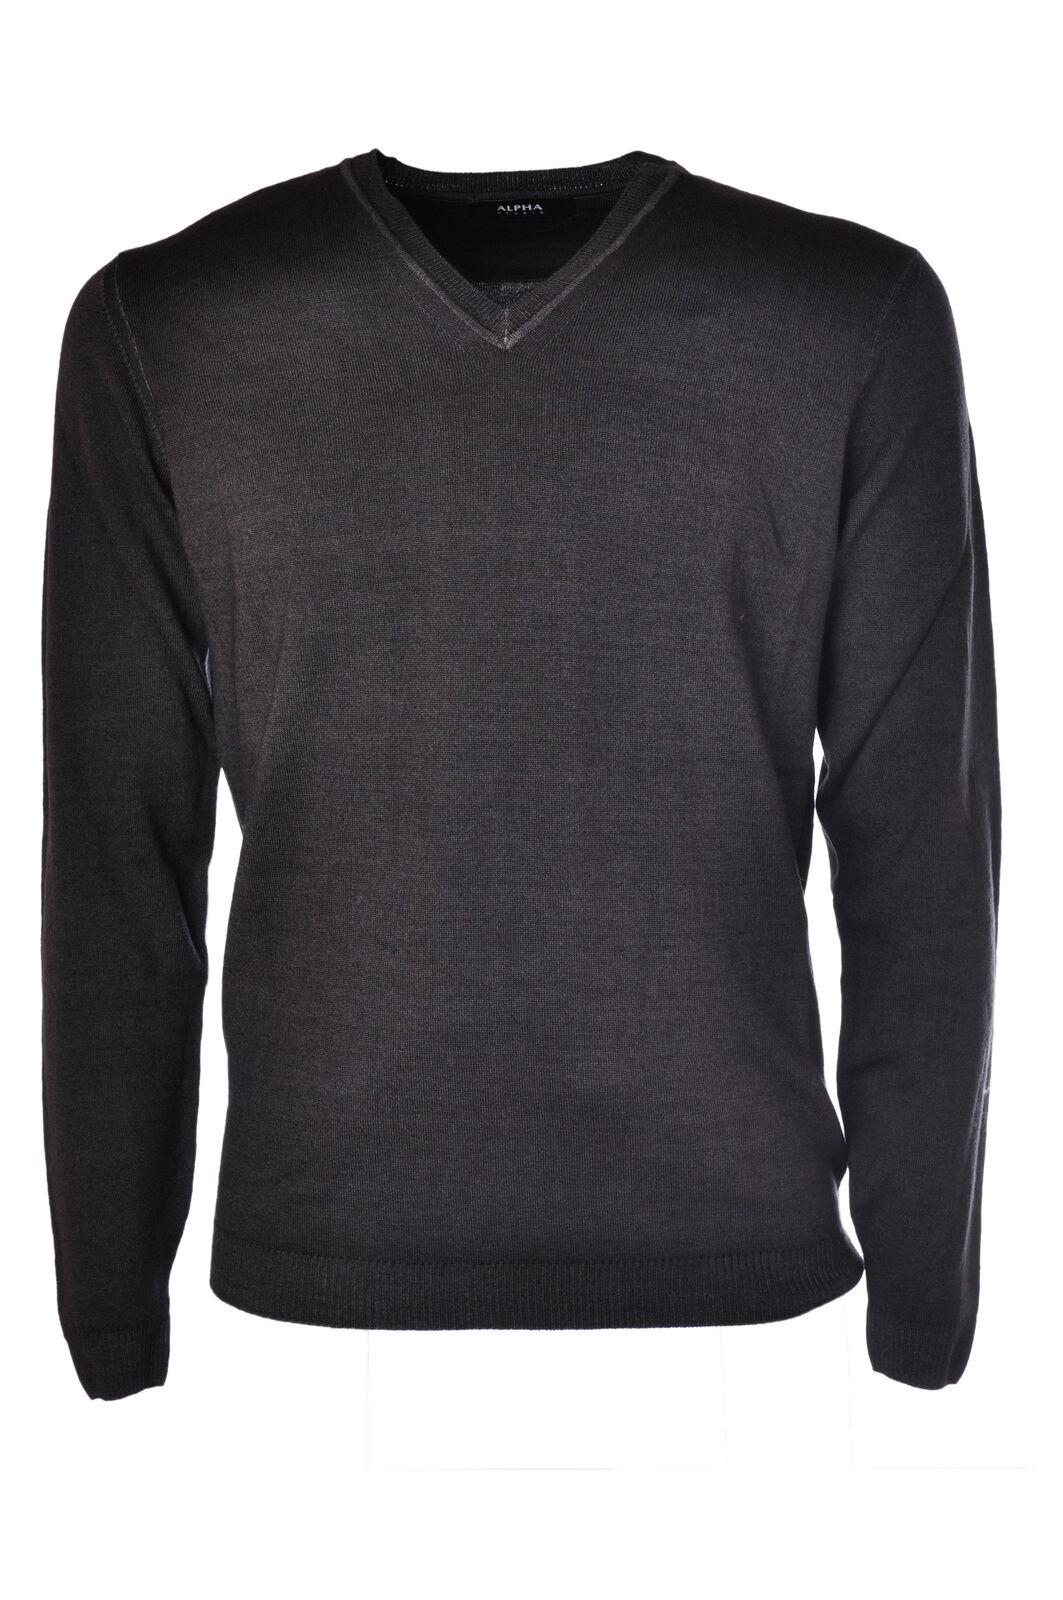 Alpha - Knitwear-Sweaters - Man - Grau - 482315C183855